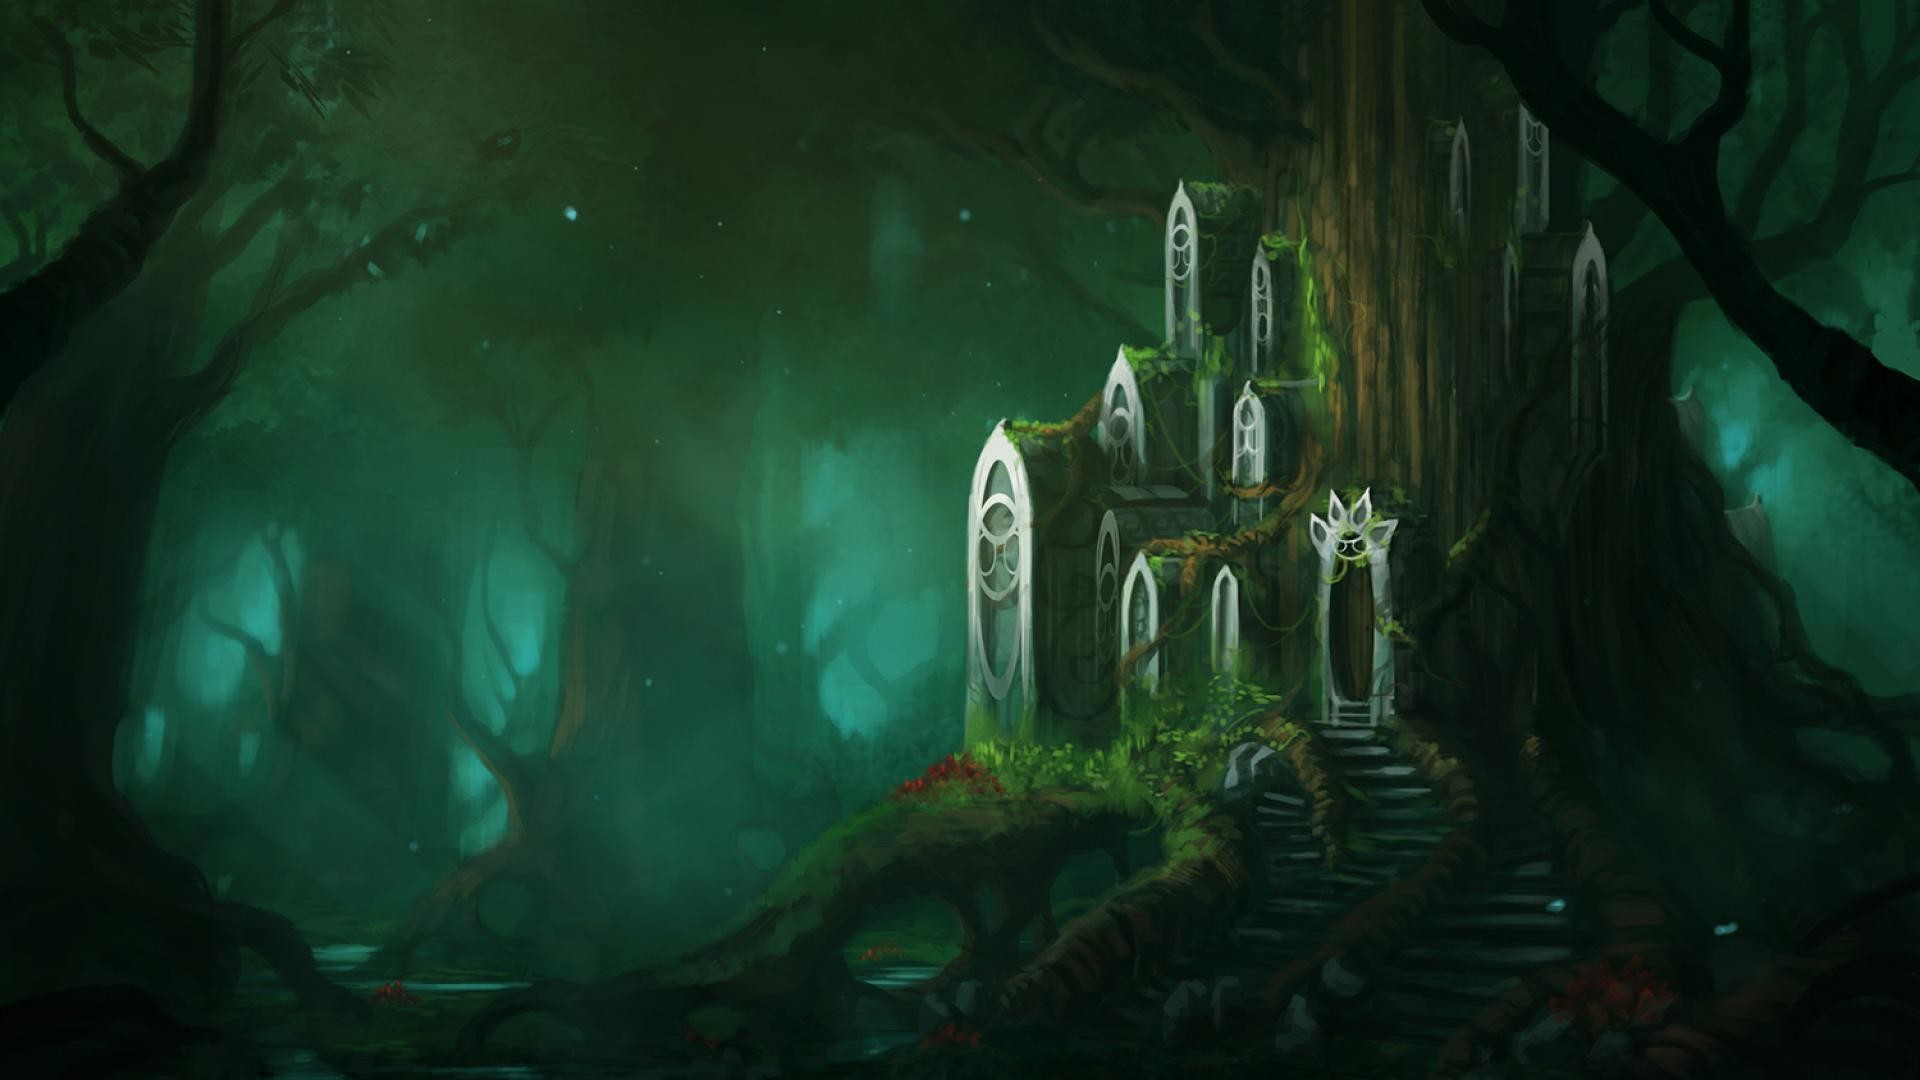 Fantasy Forest Wallpaper Download 13126 Full HD Wallpaper Desktop .